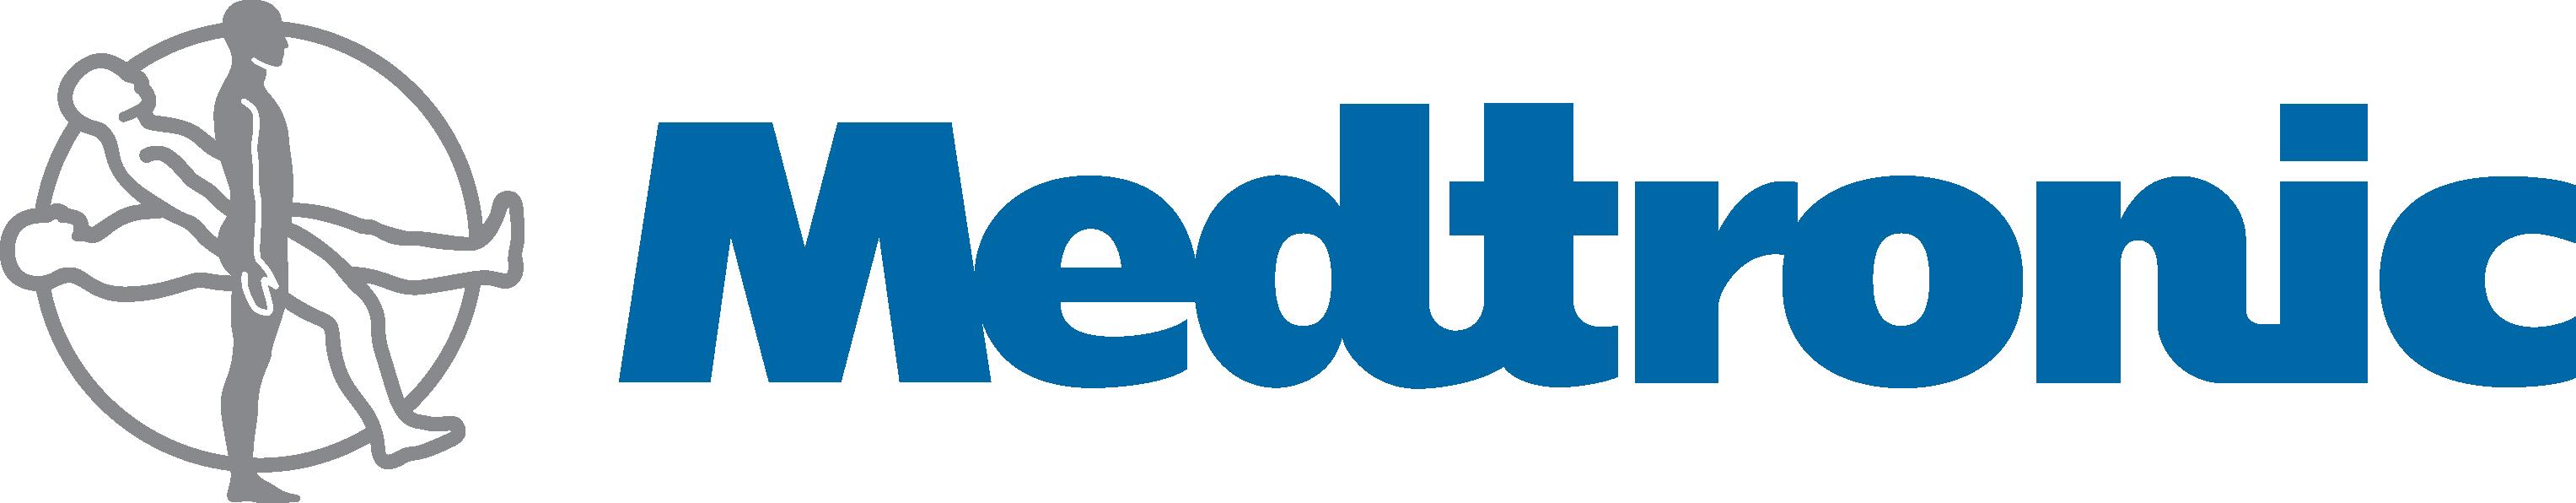 Medtronic Logos